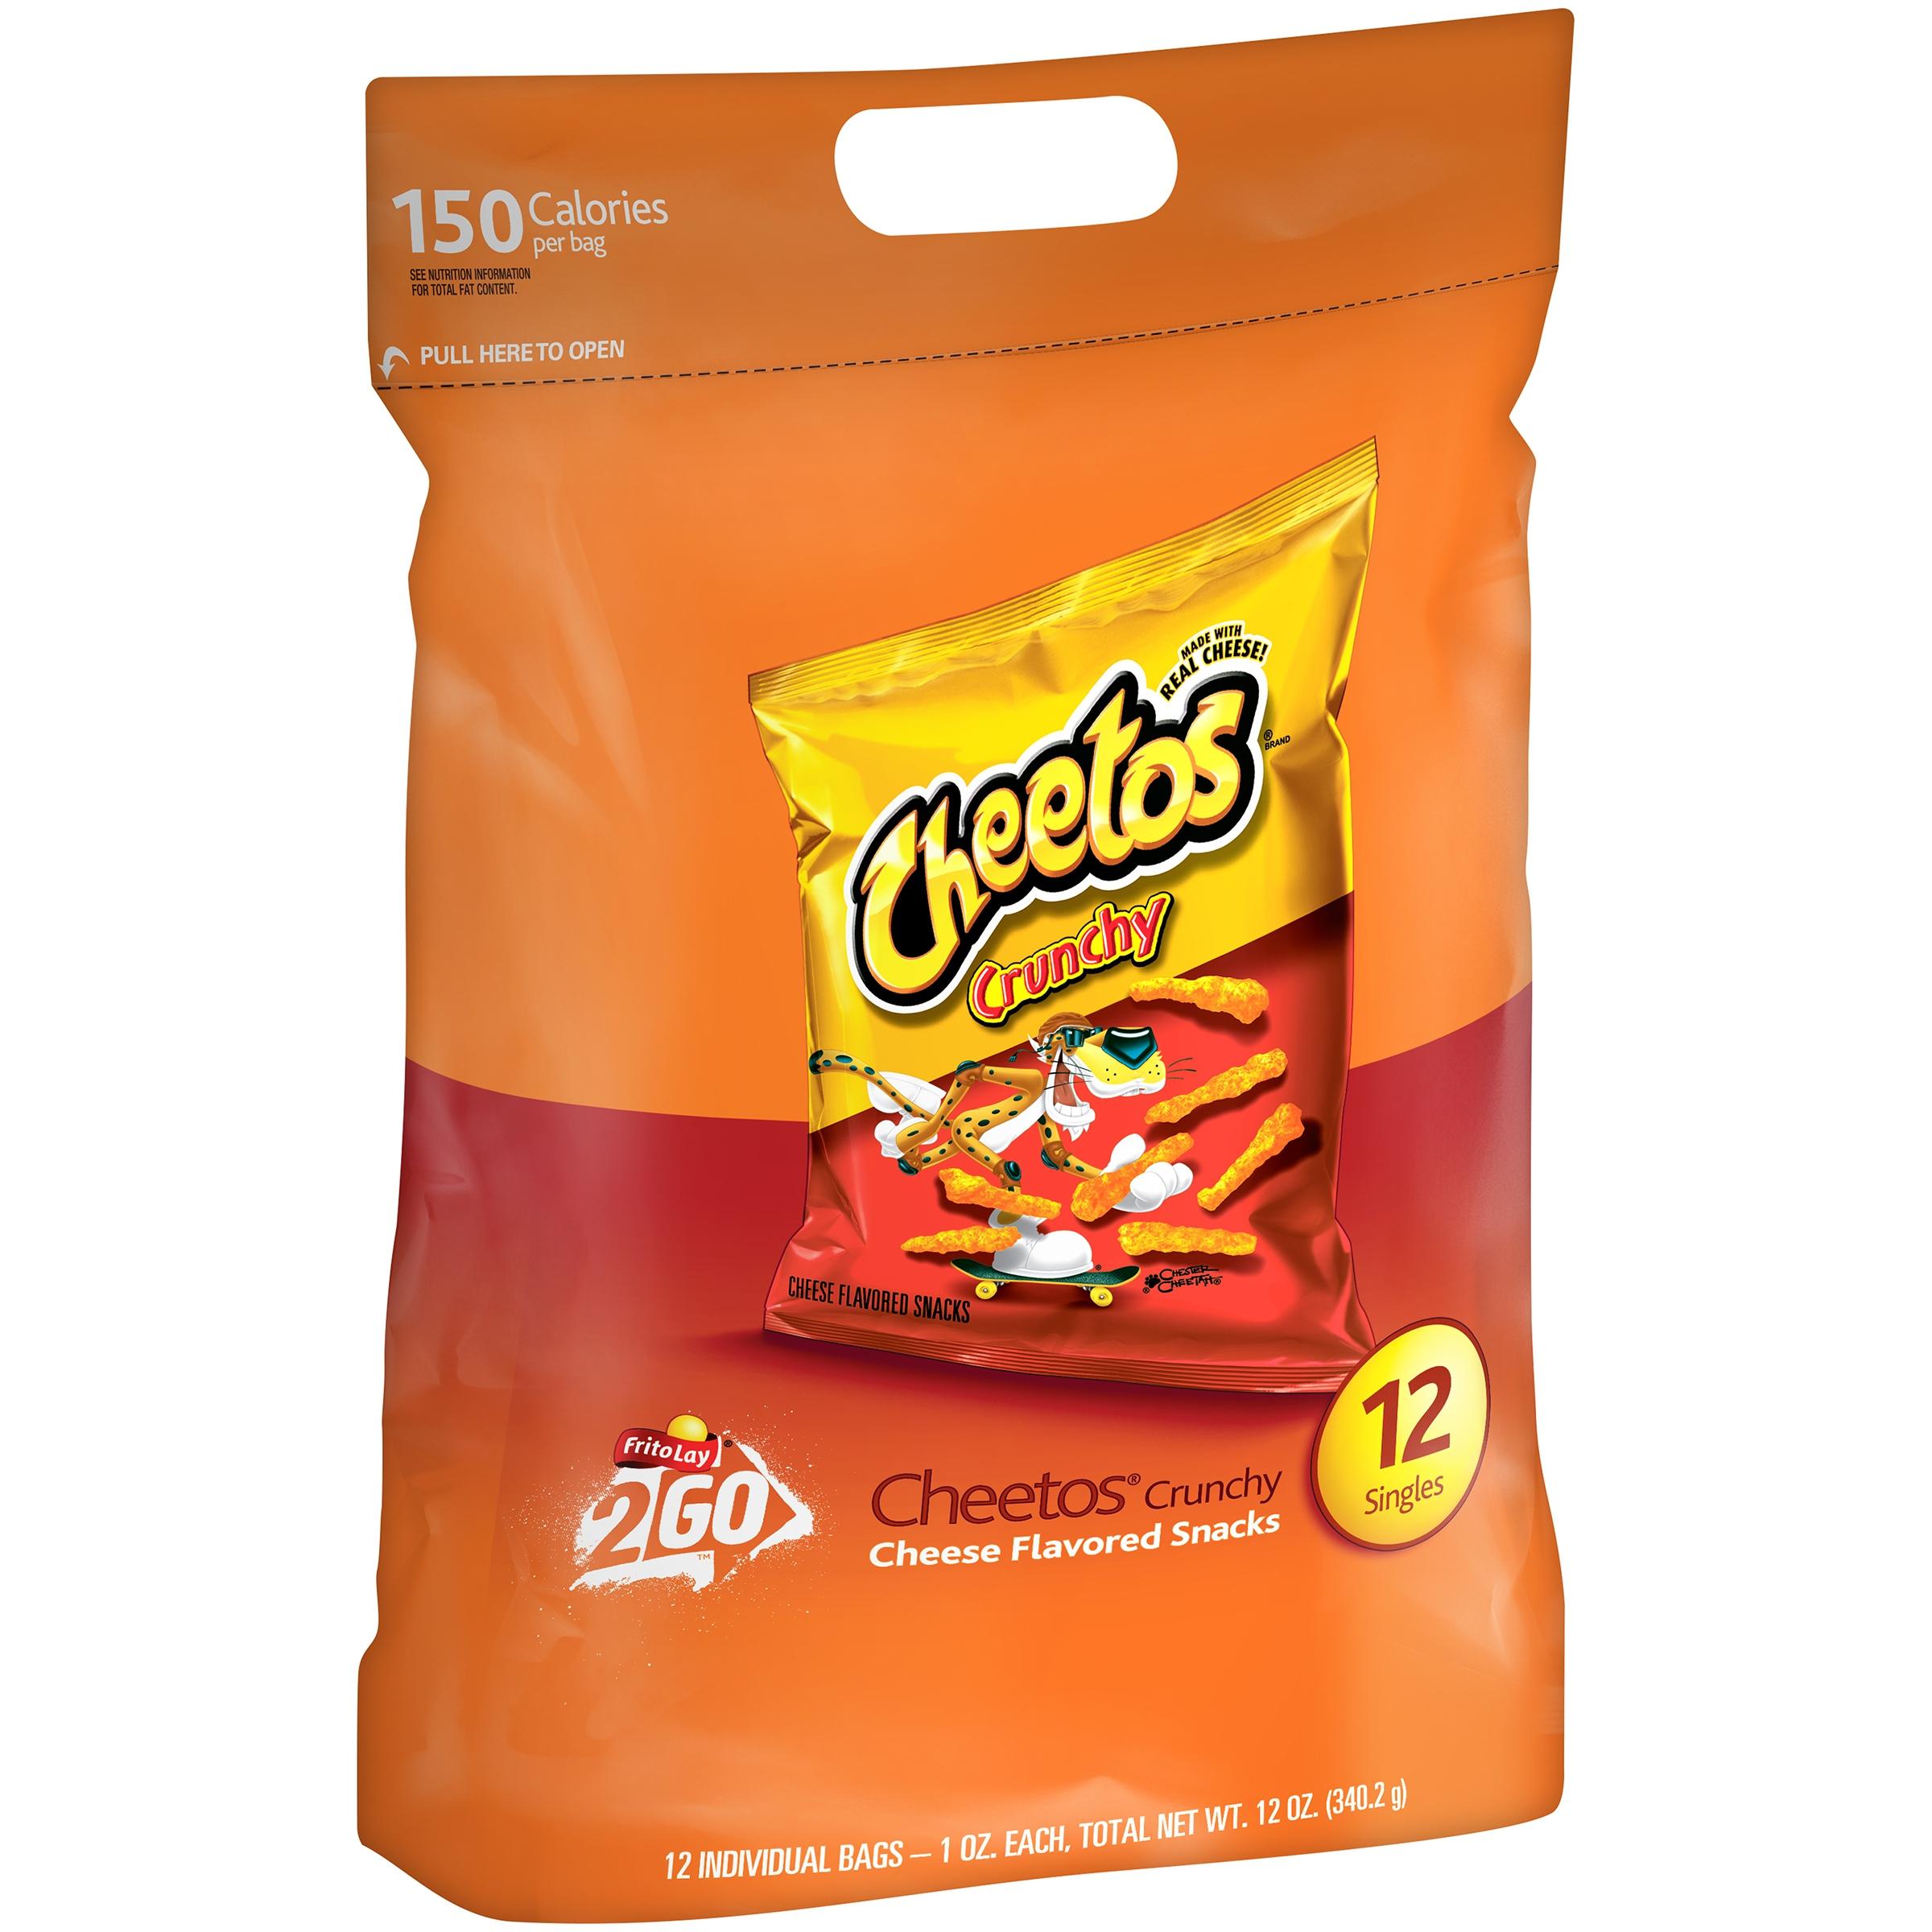 Frito - Lay, inc. Cheetos ® Crunchy Singles Cheese Flavored Snacks 12 - 1 oz. Bags